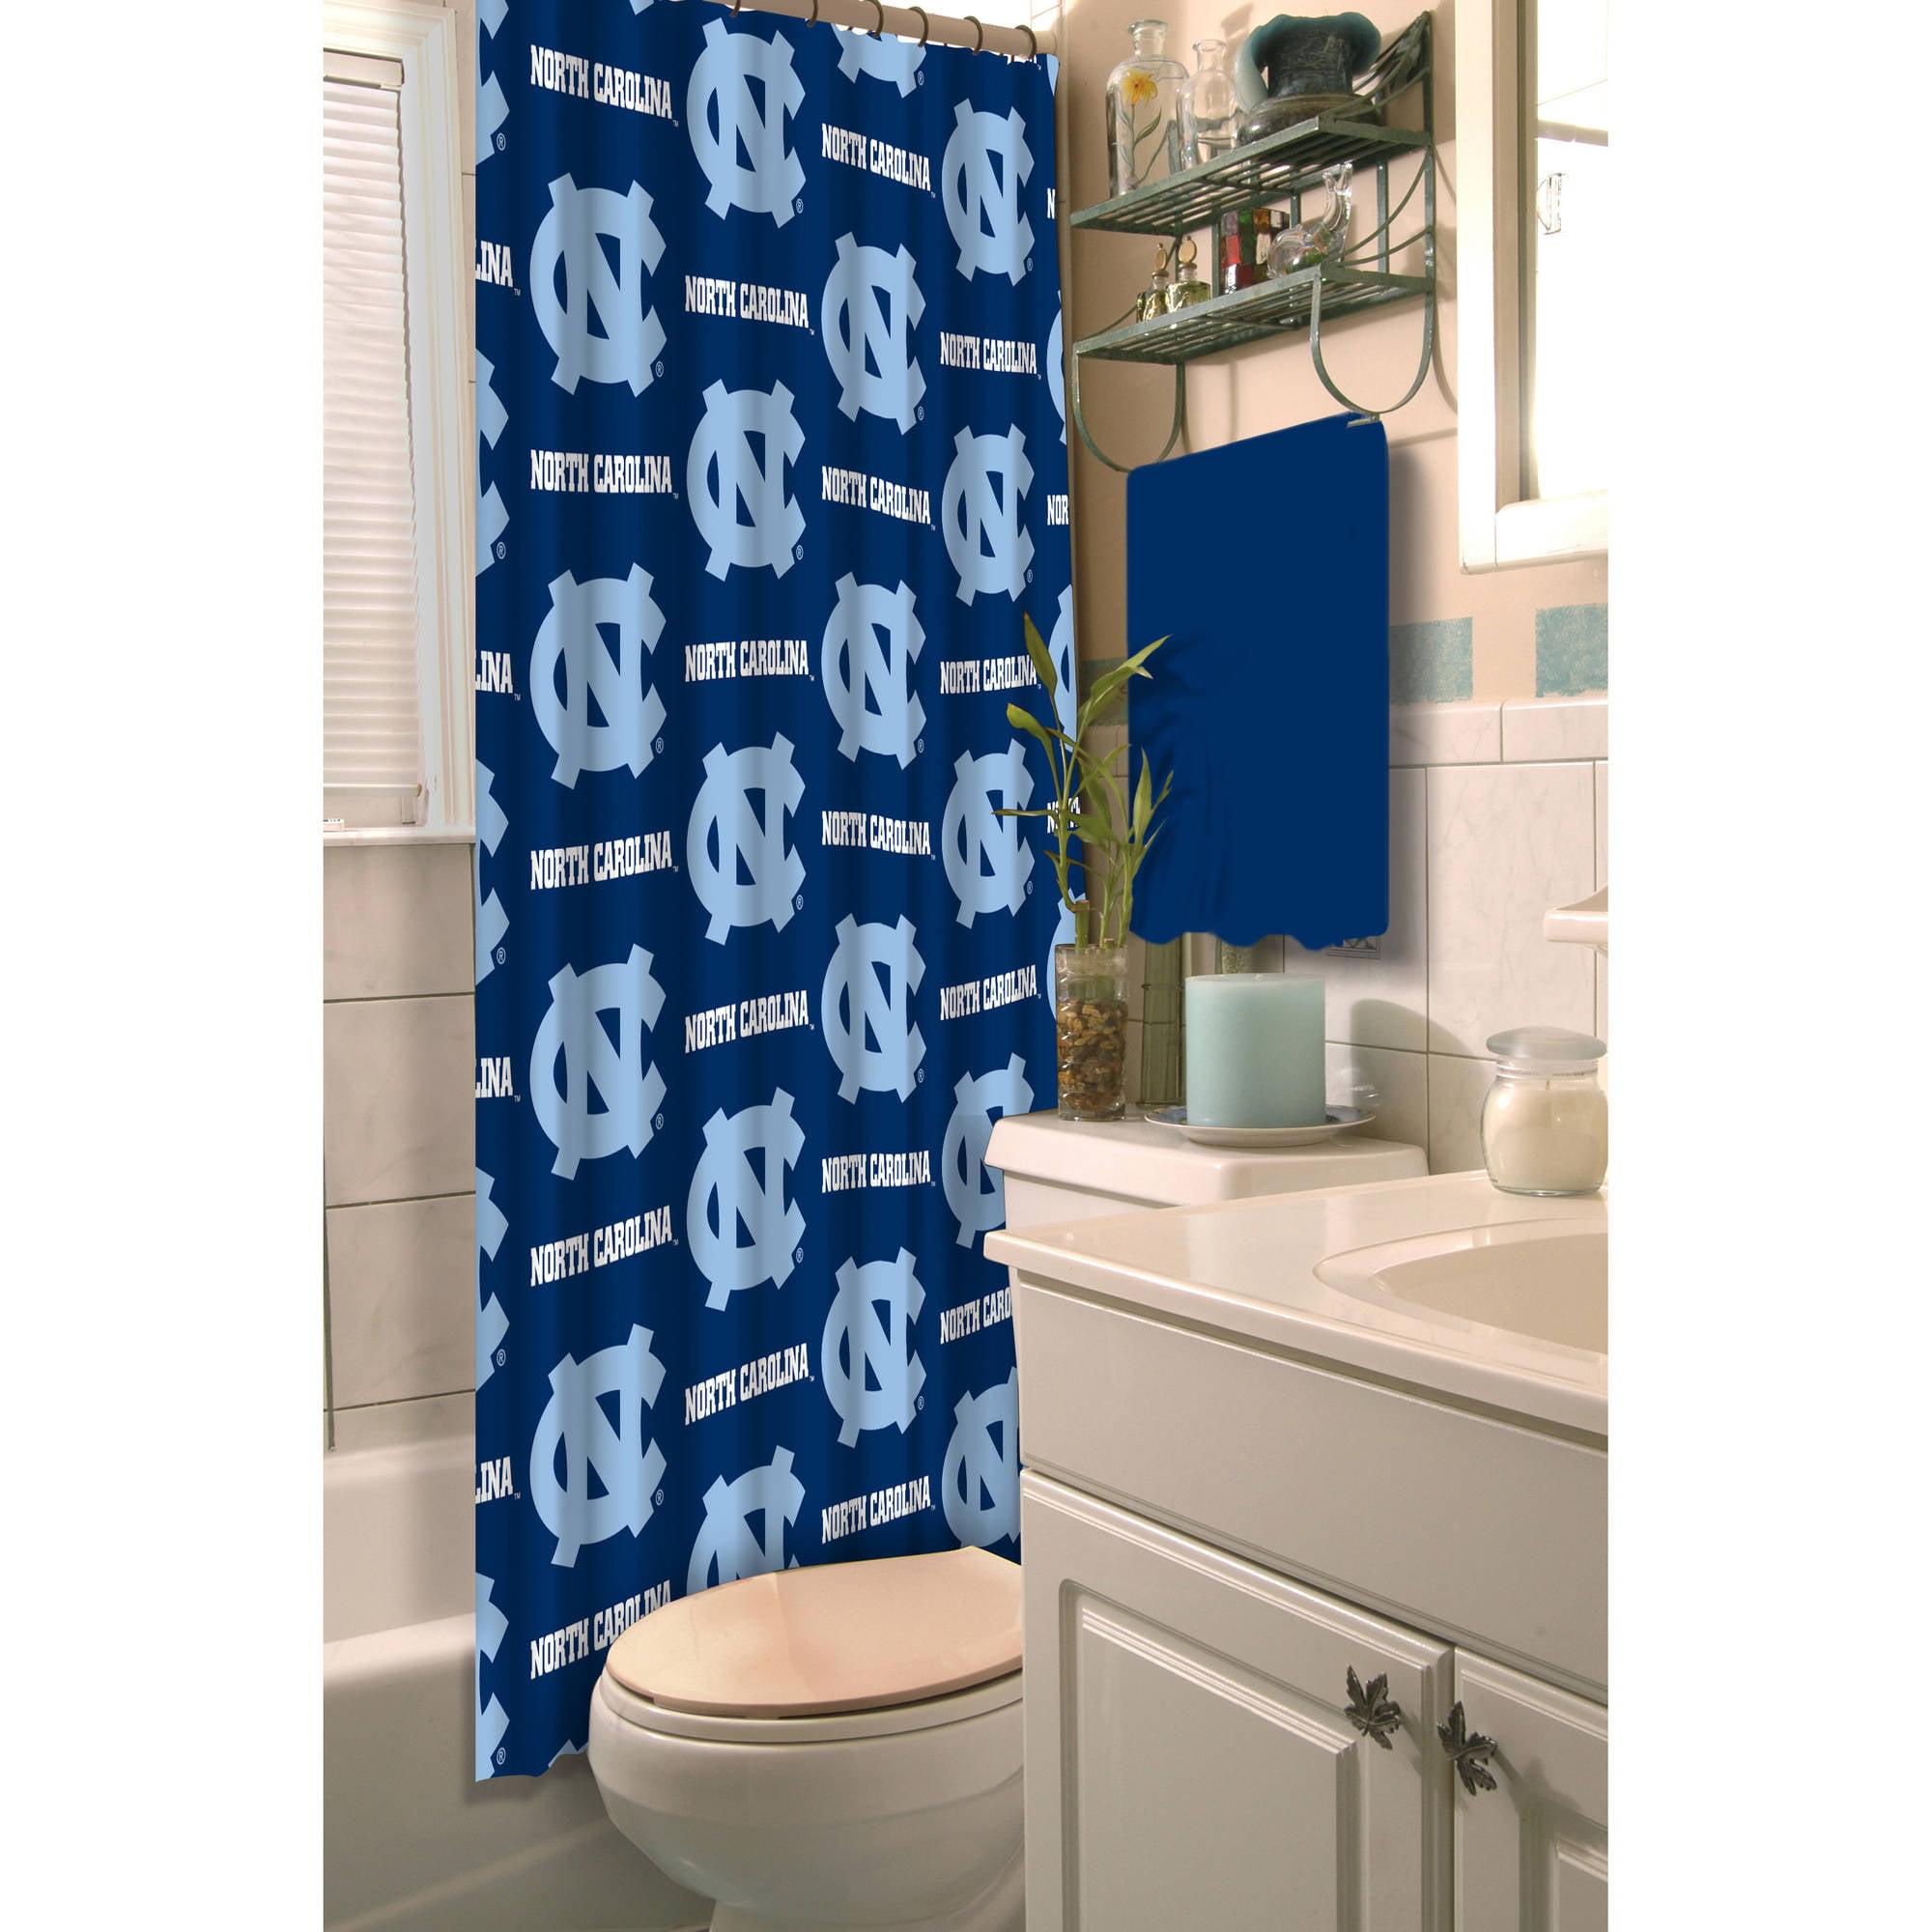 NCAA University of North Carolina Decorative Bath Collection - Shower Curtain